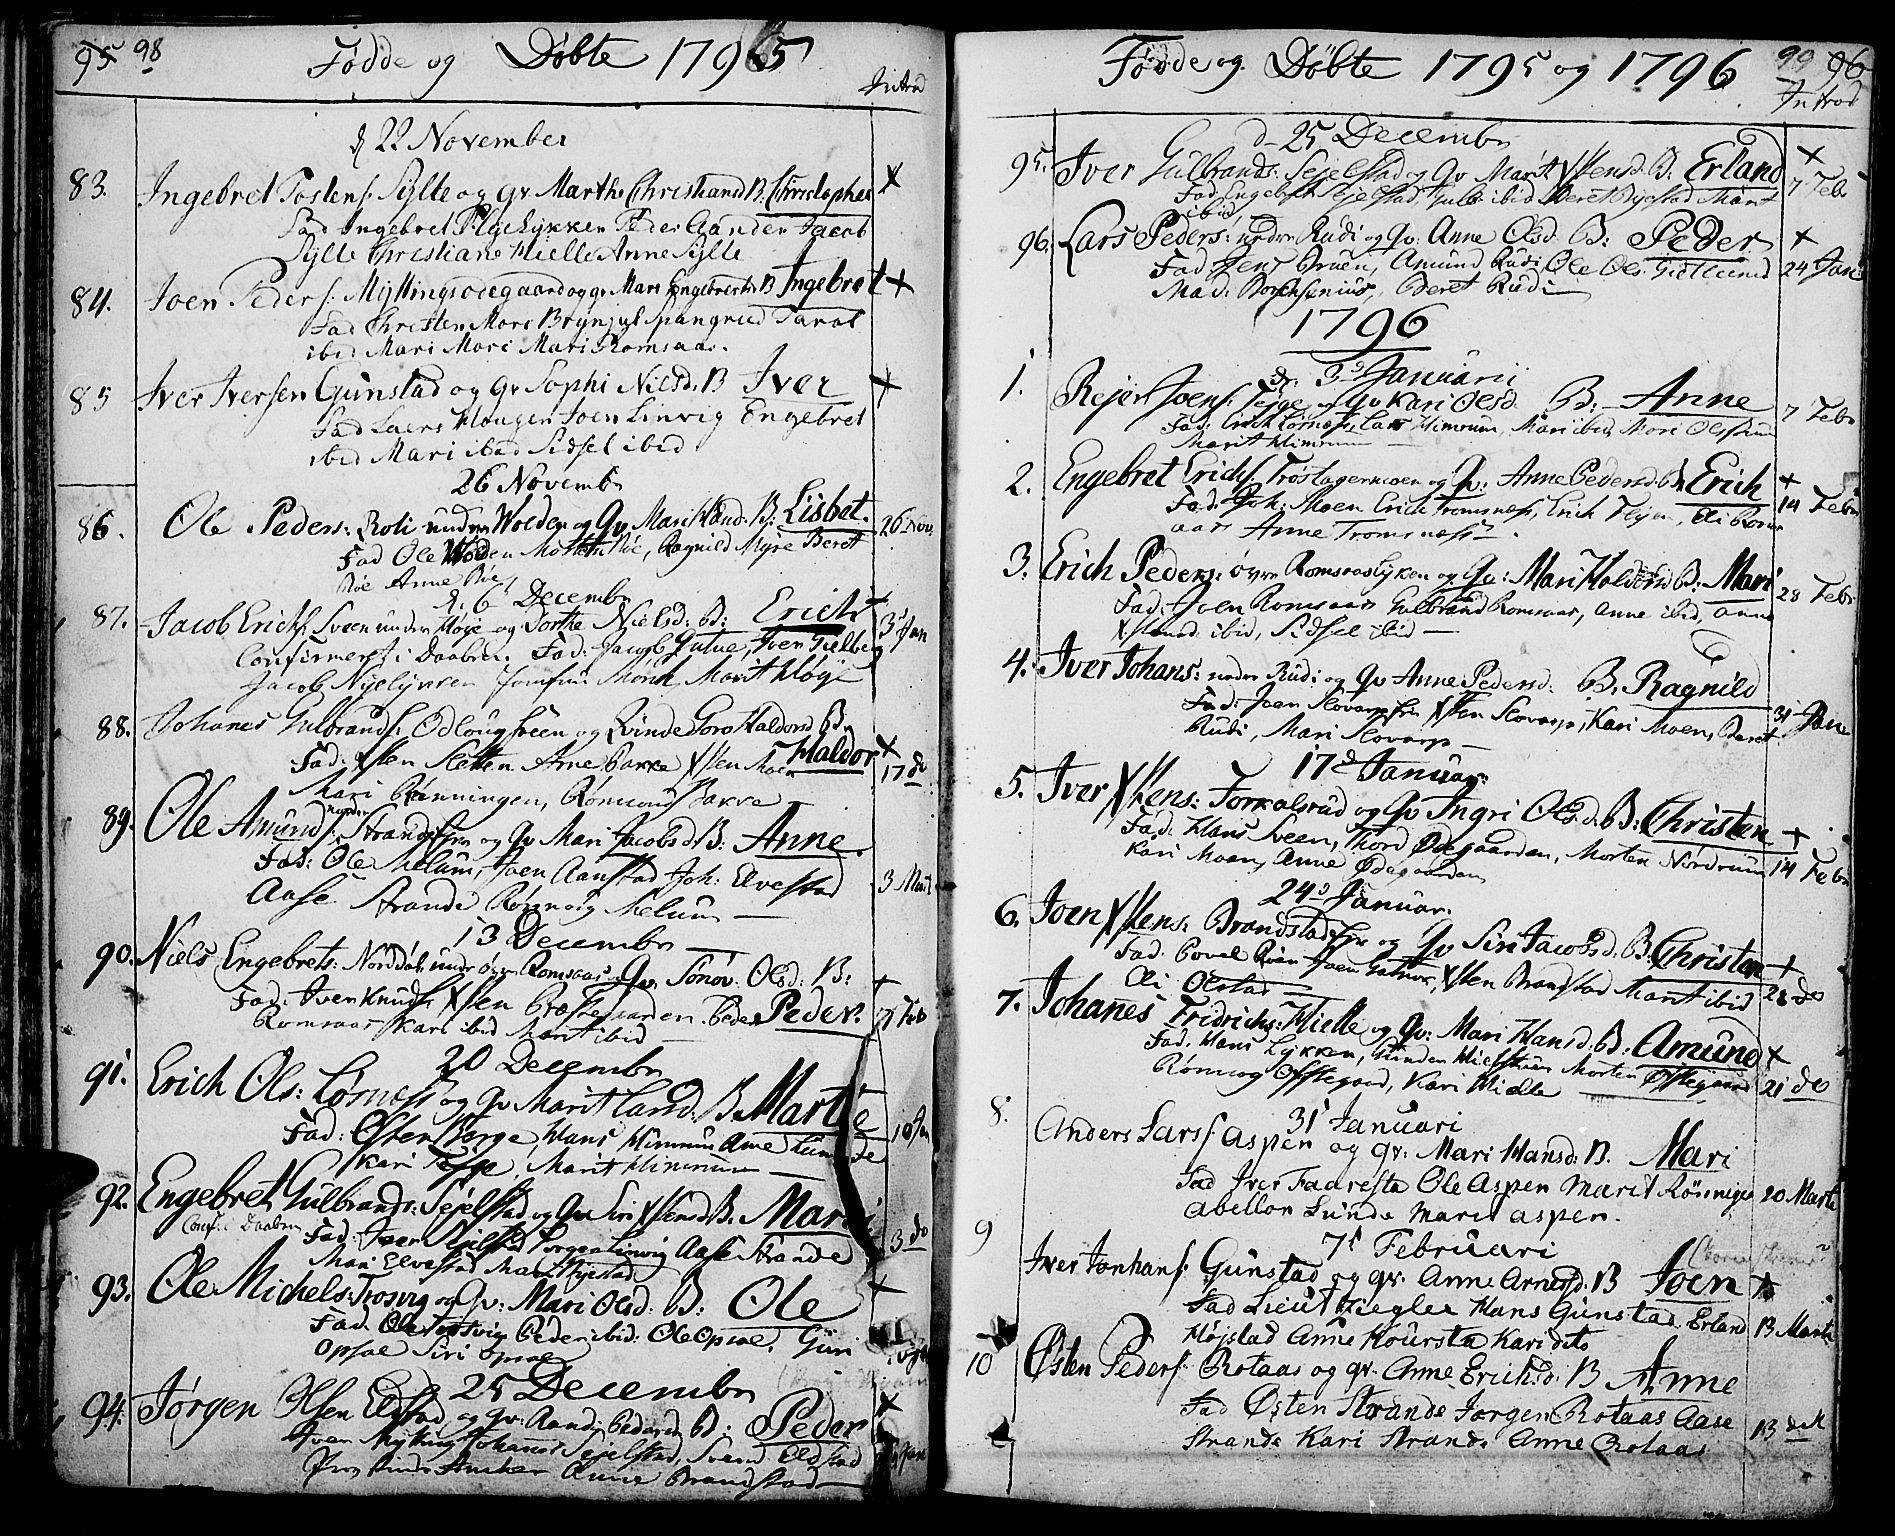 SAH, Ringebu prestekontor, Ministerialbok nr. 3, 1781-1820, s. 98-99